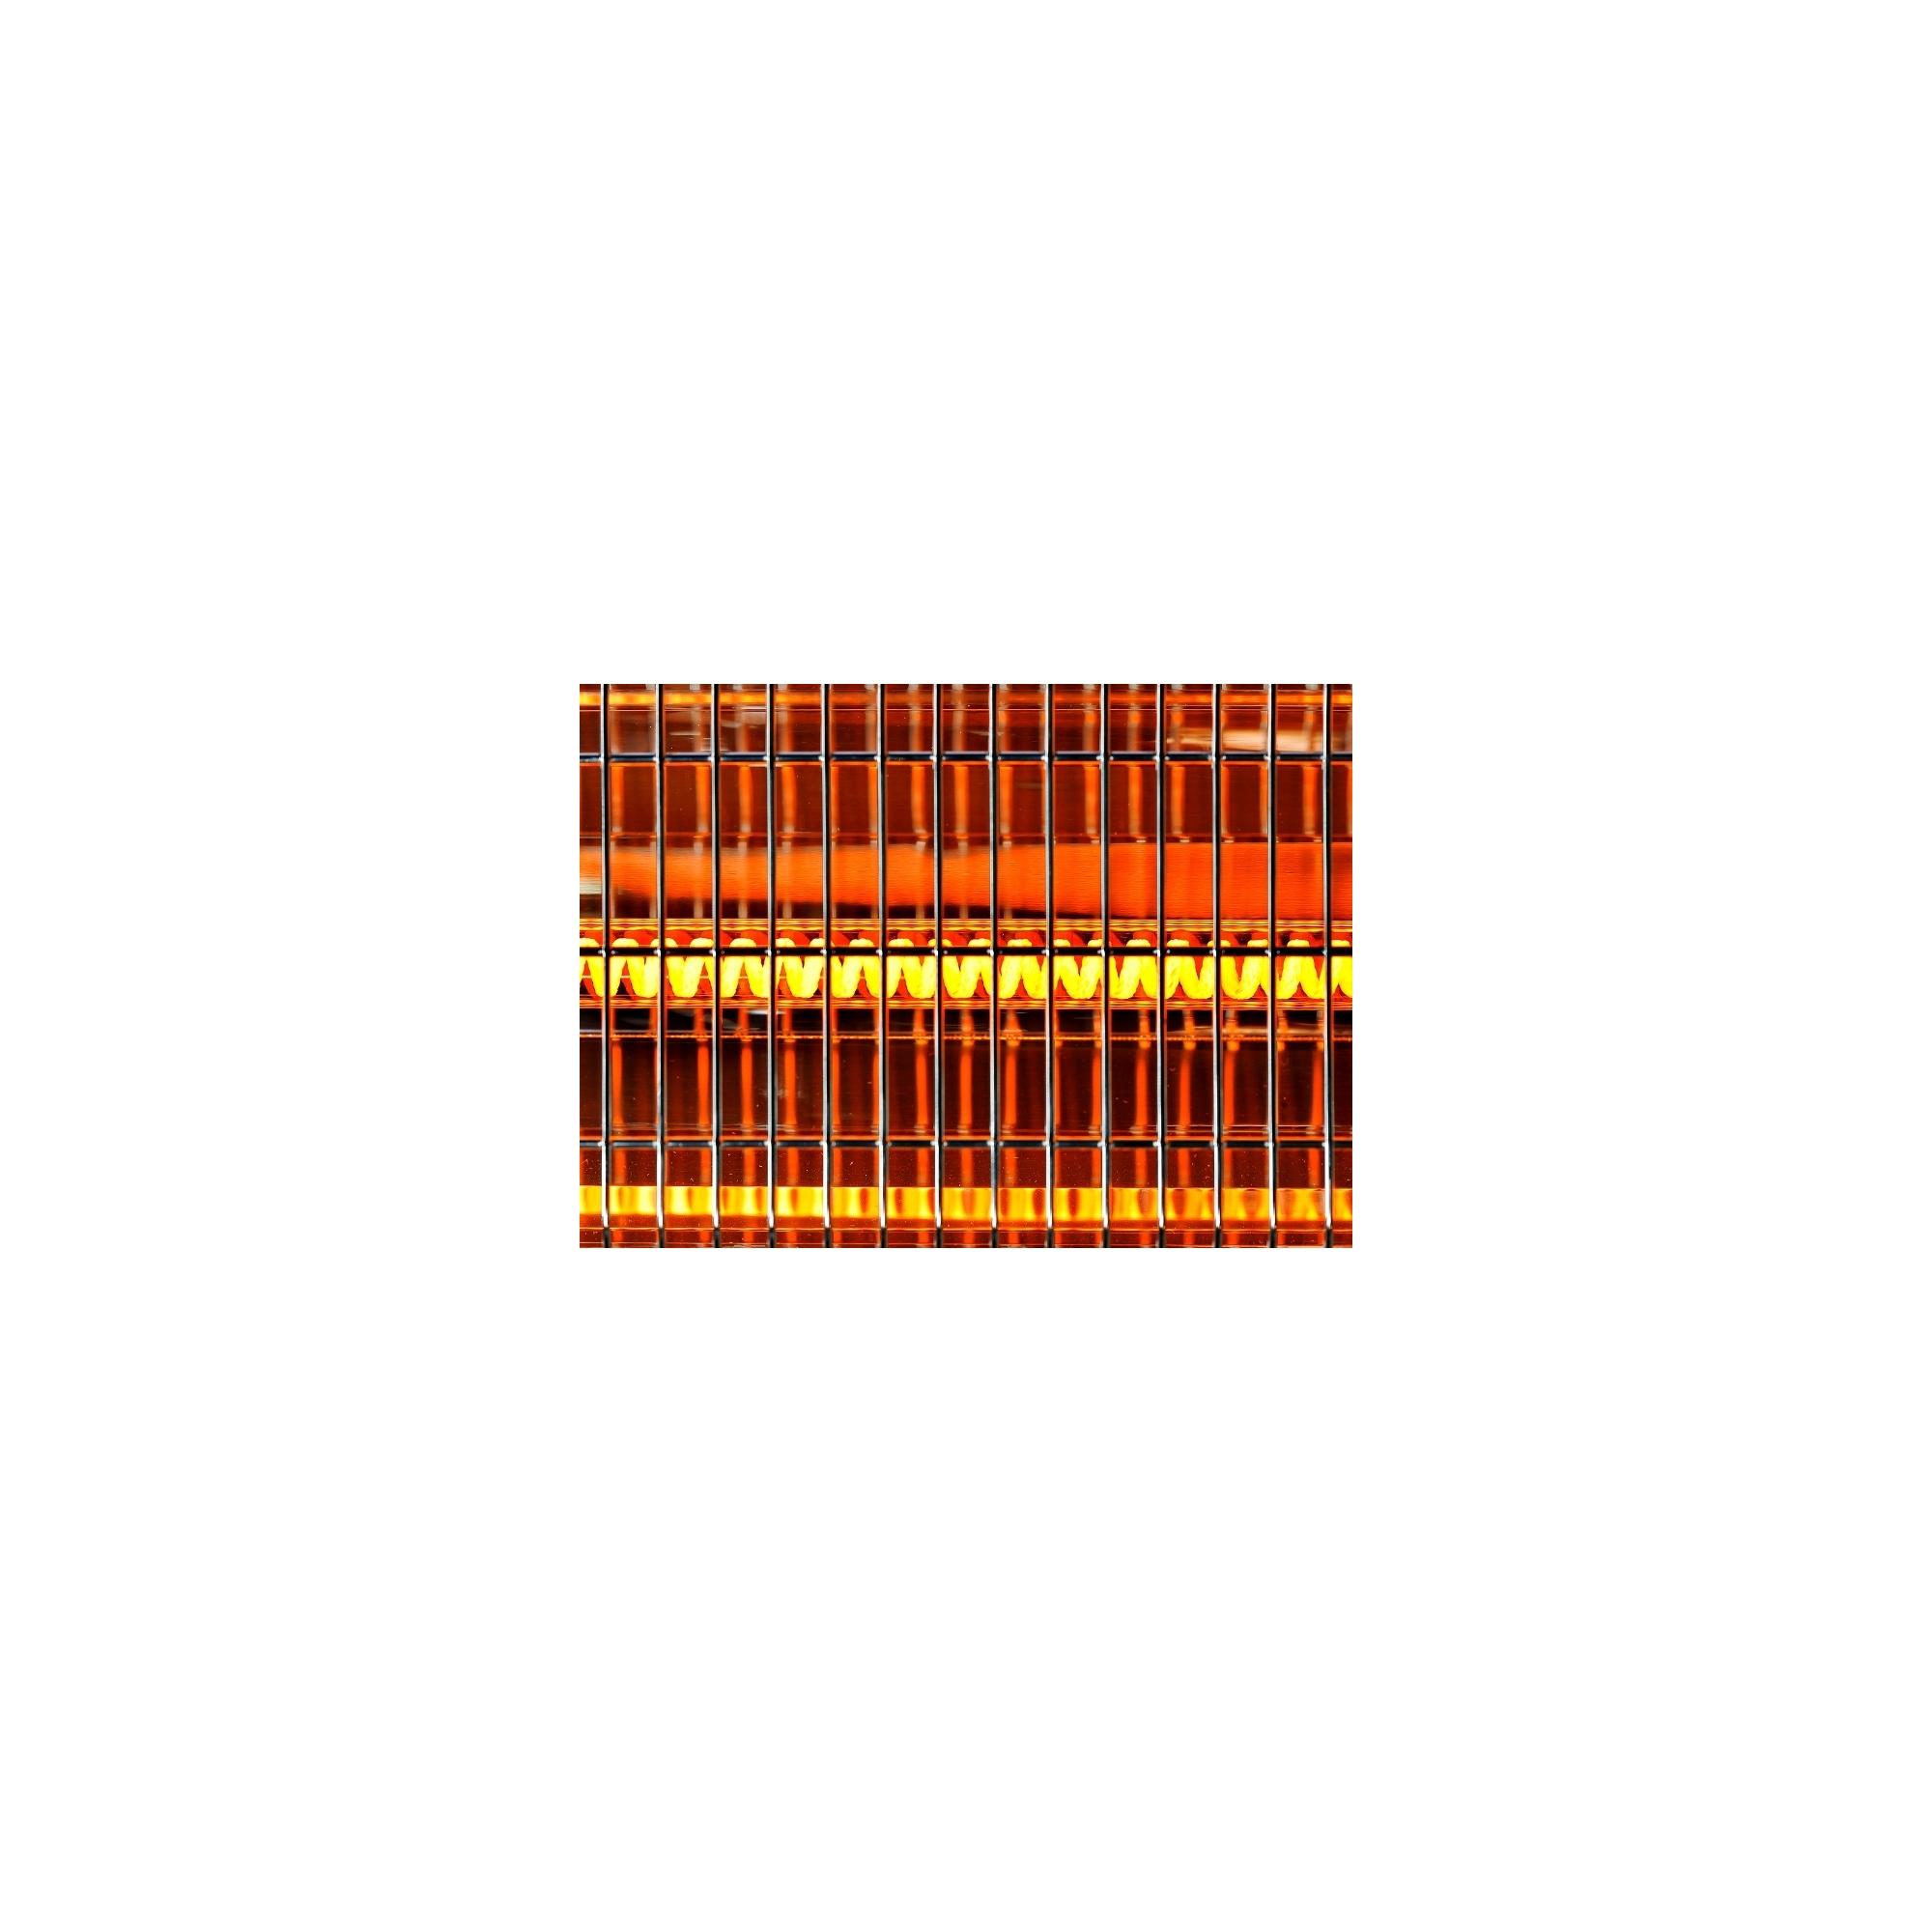 76544eb8b1e Infrapuna soojuskiirgur Veltron PREMIUM SLIM SH24 2,4kW @ Grillid.ee